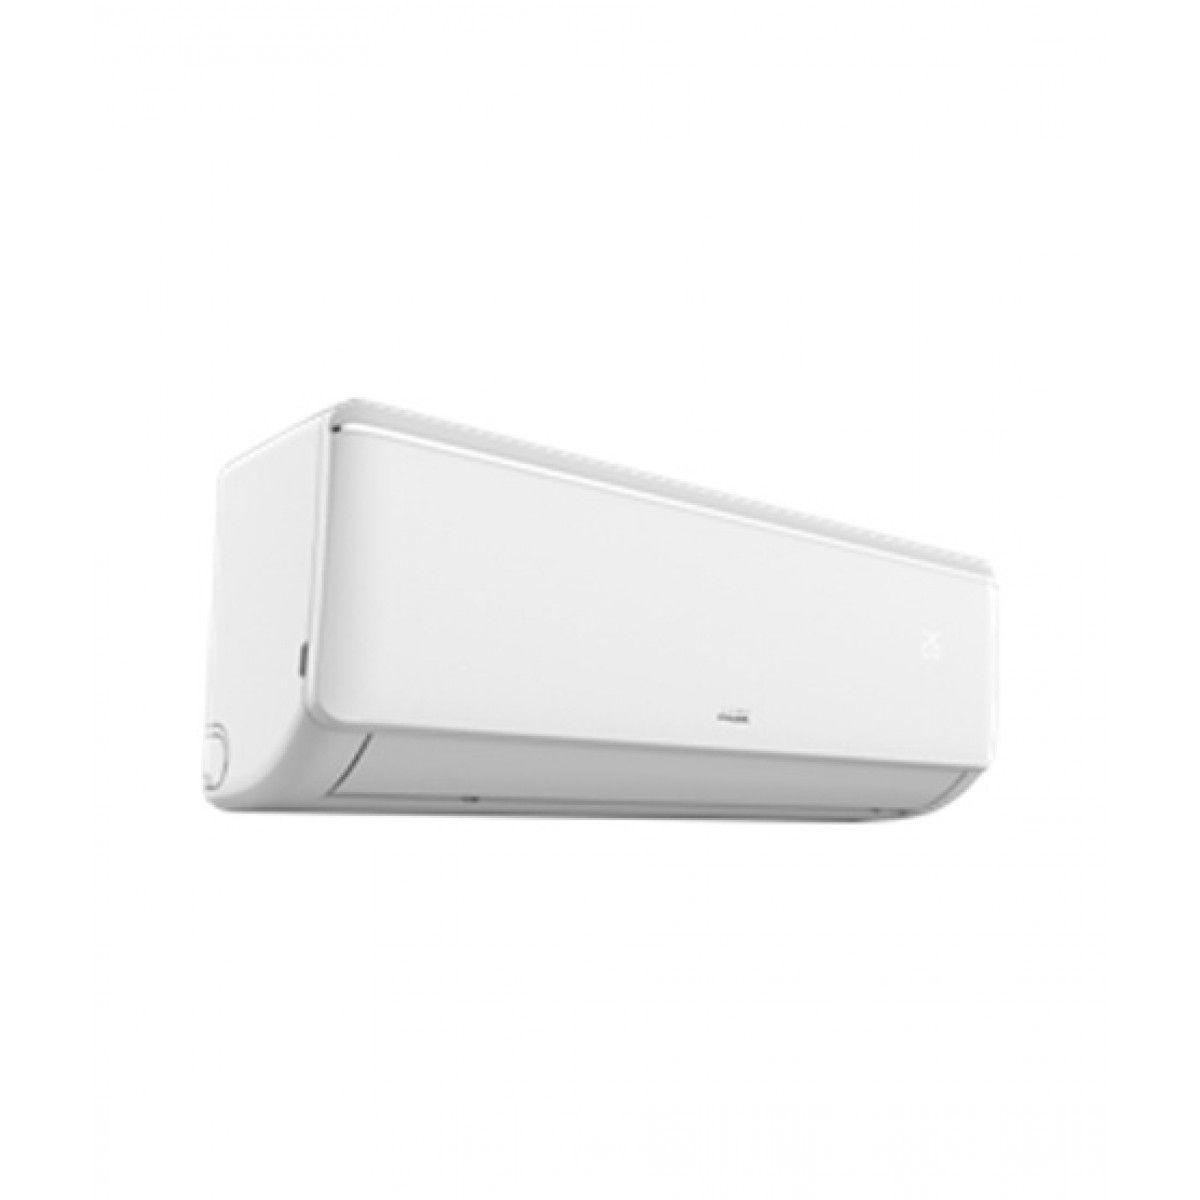 PEL Majestic 4D Split Air Conditioner 1.5 Ton (PSAC-18K)